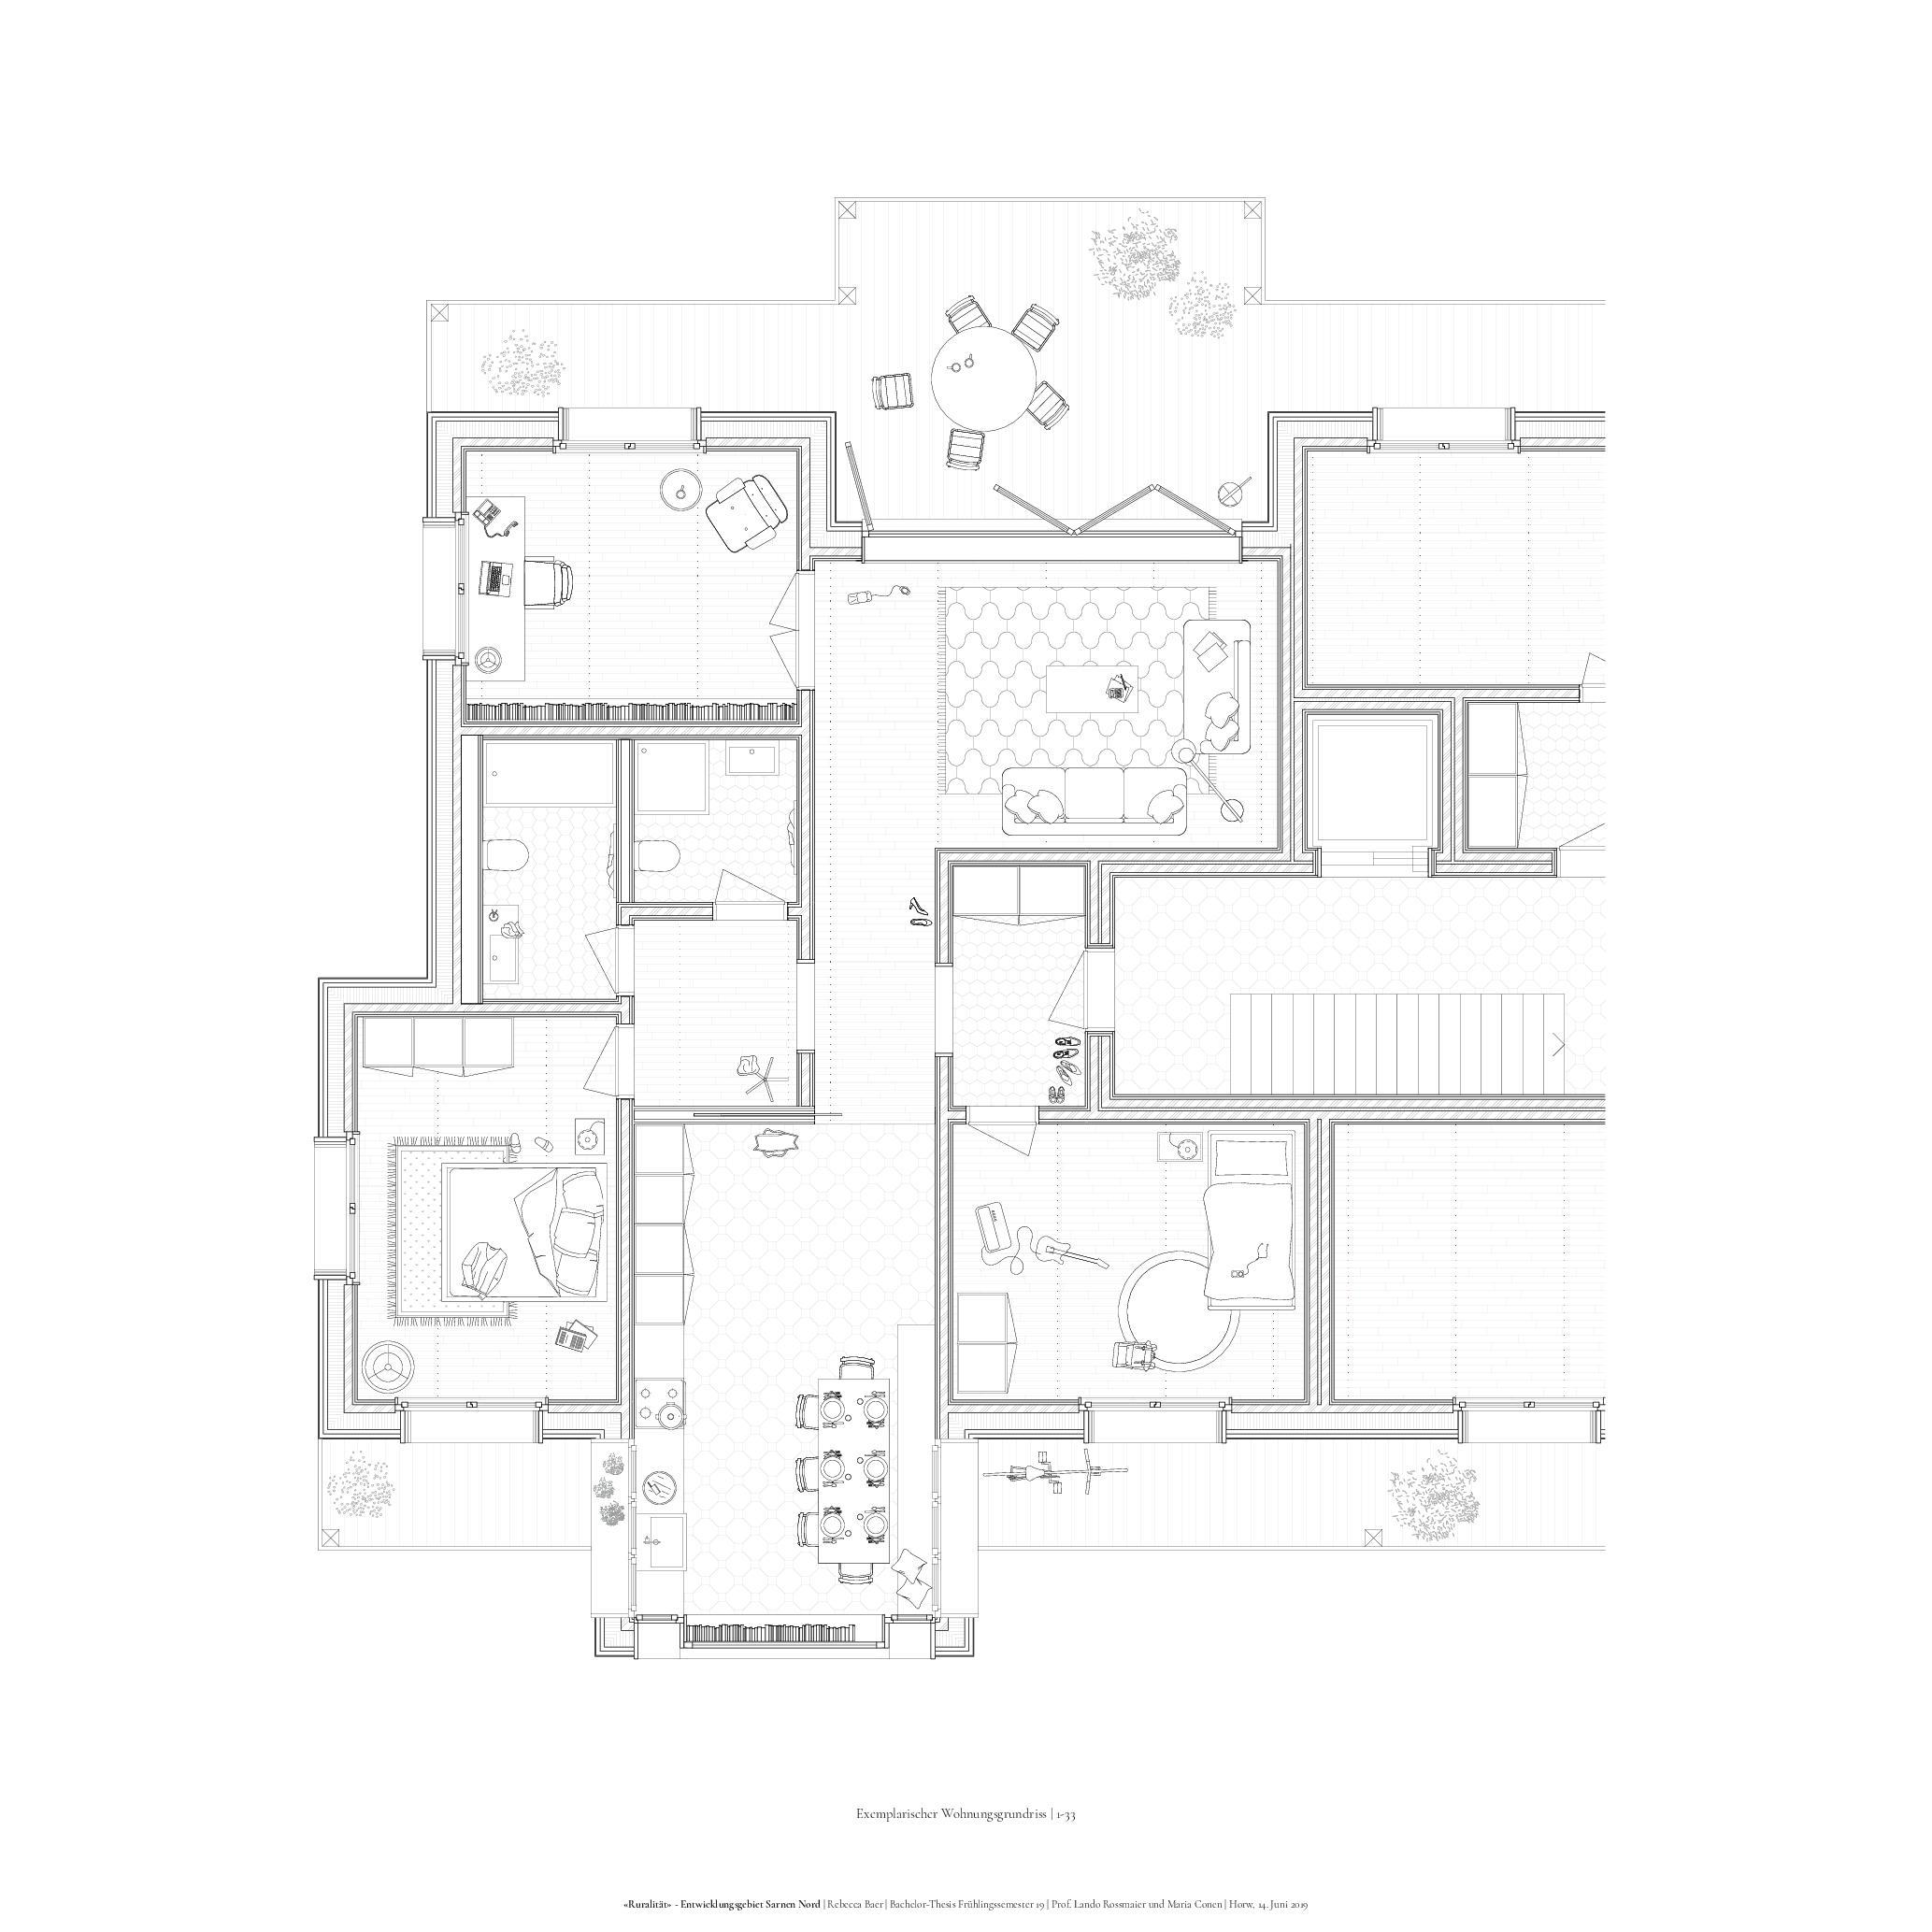 Wohnungsgrundriss 1-33